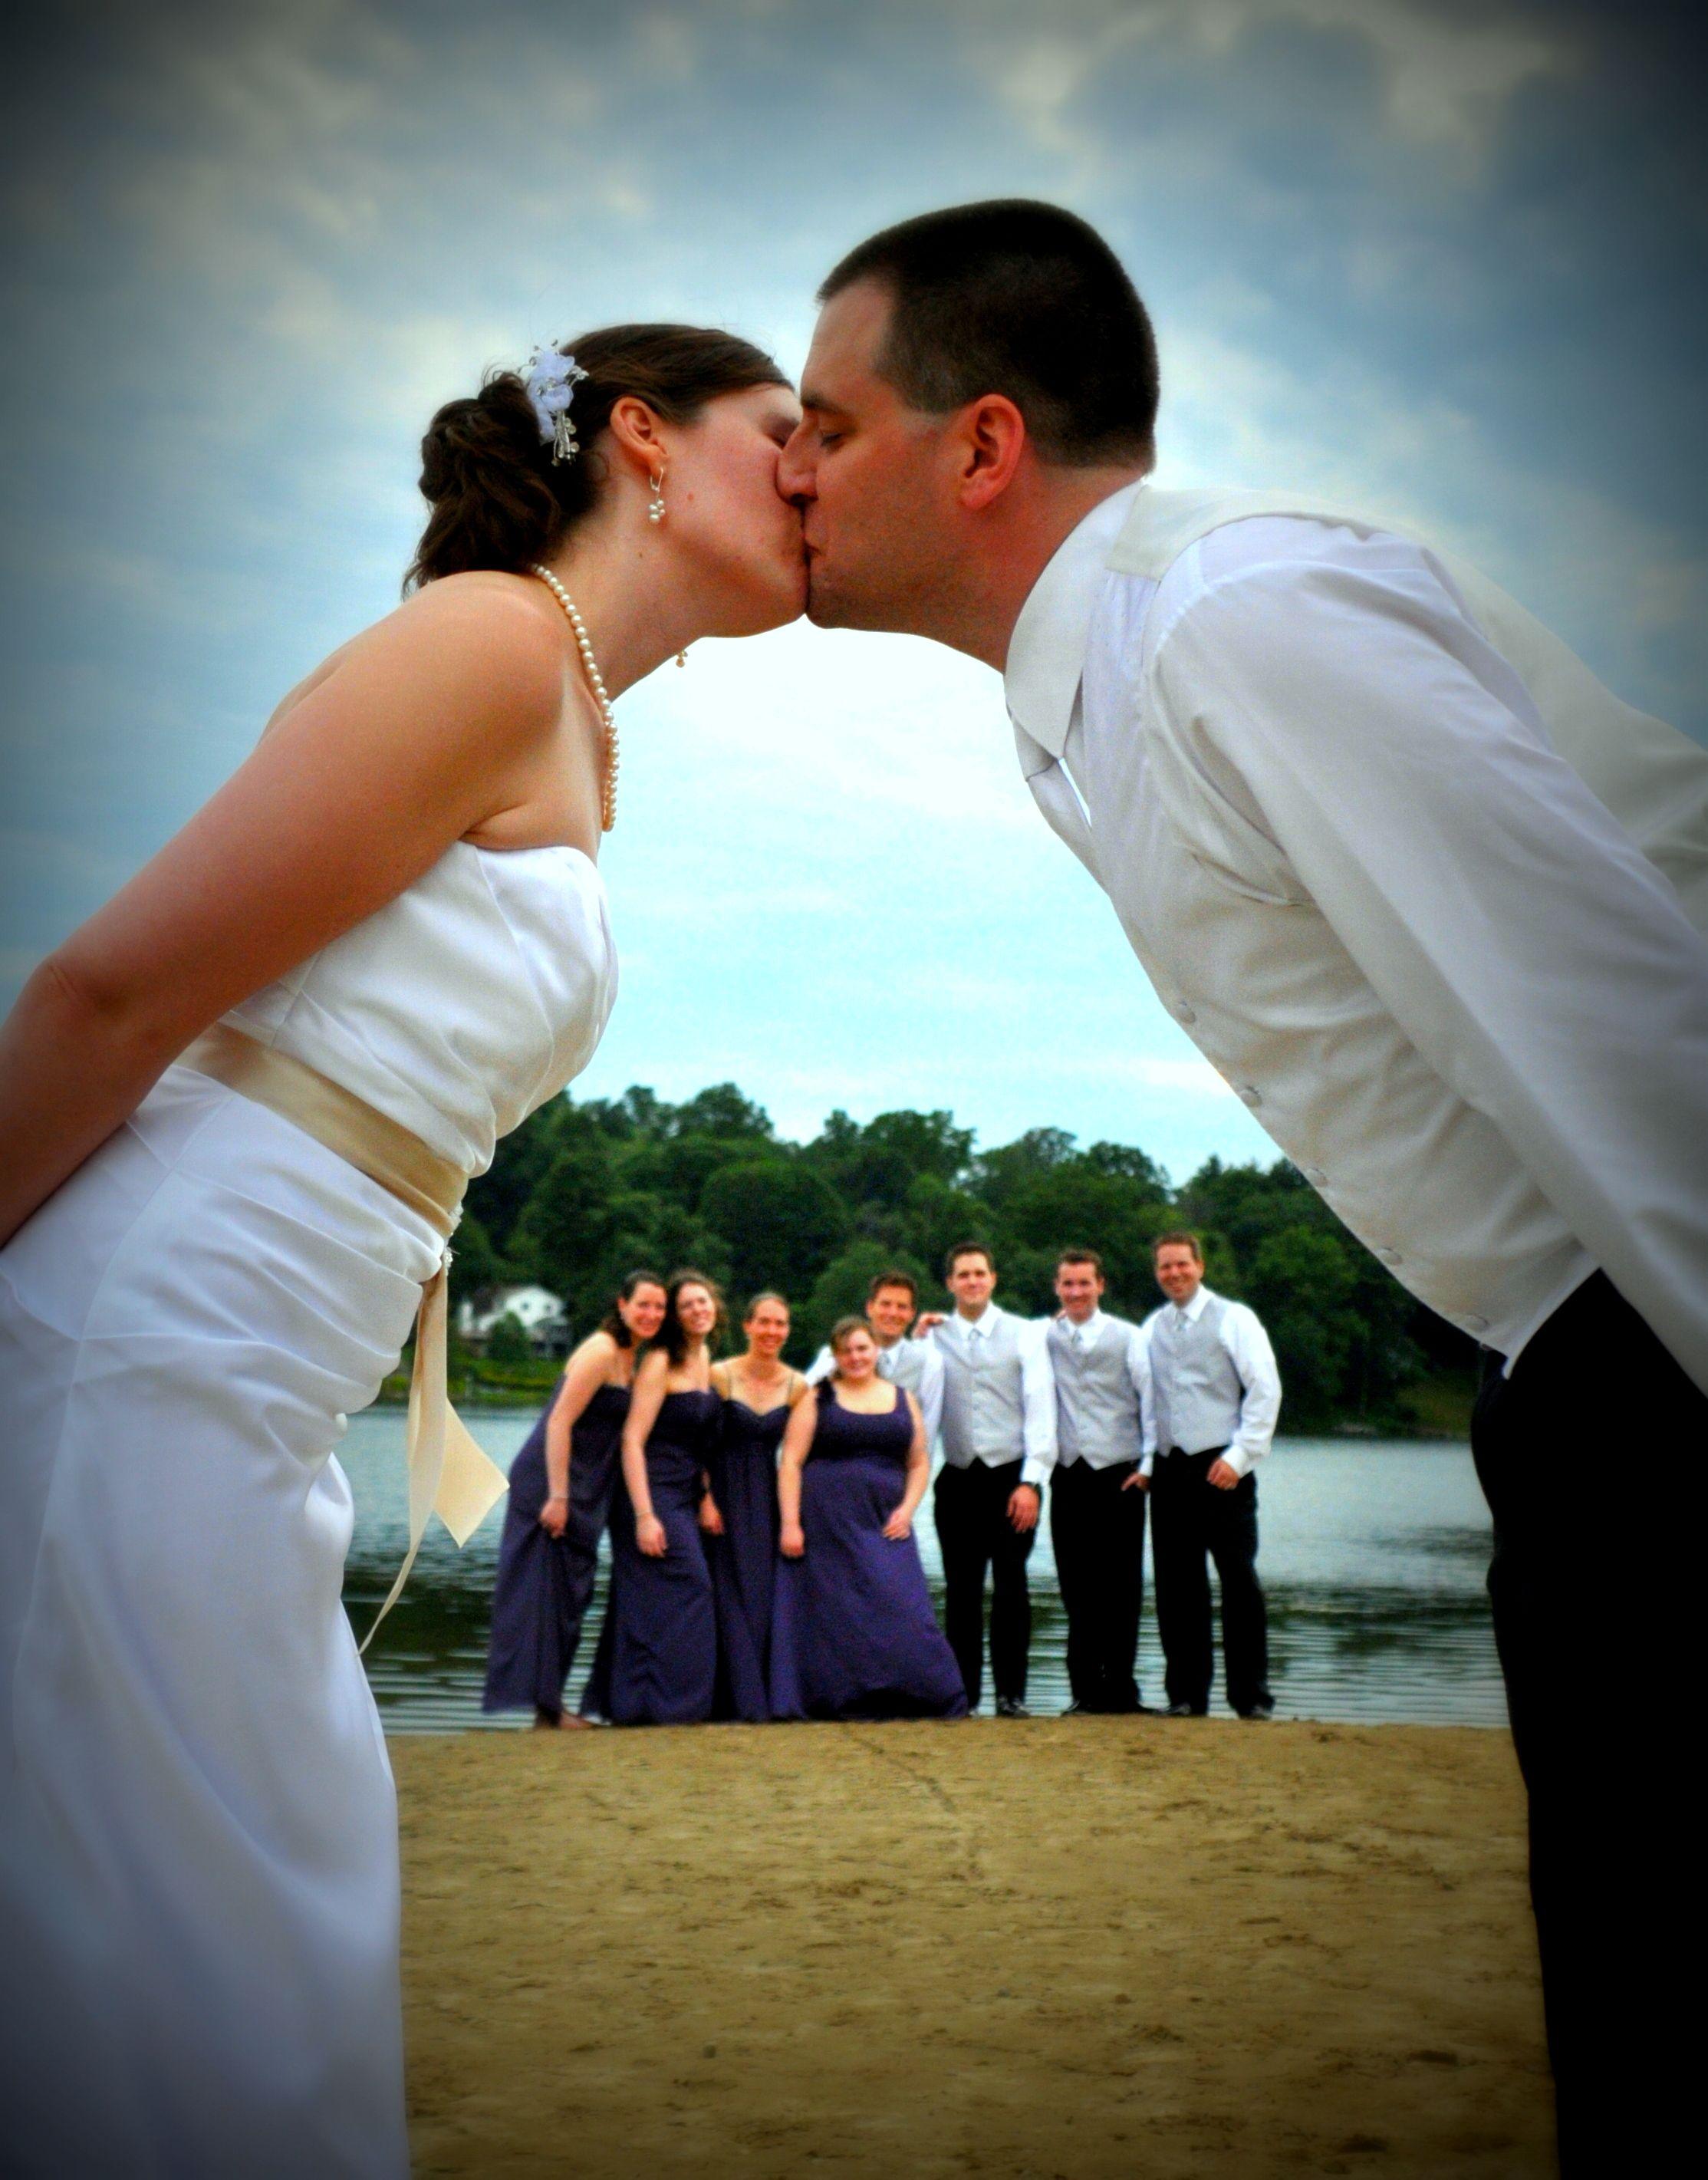 Unique Wedding Pose, Wedding Photo Ideas | Wedding poses ...